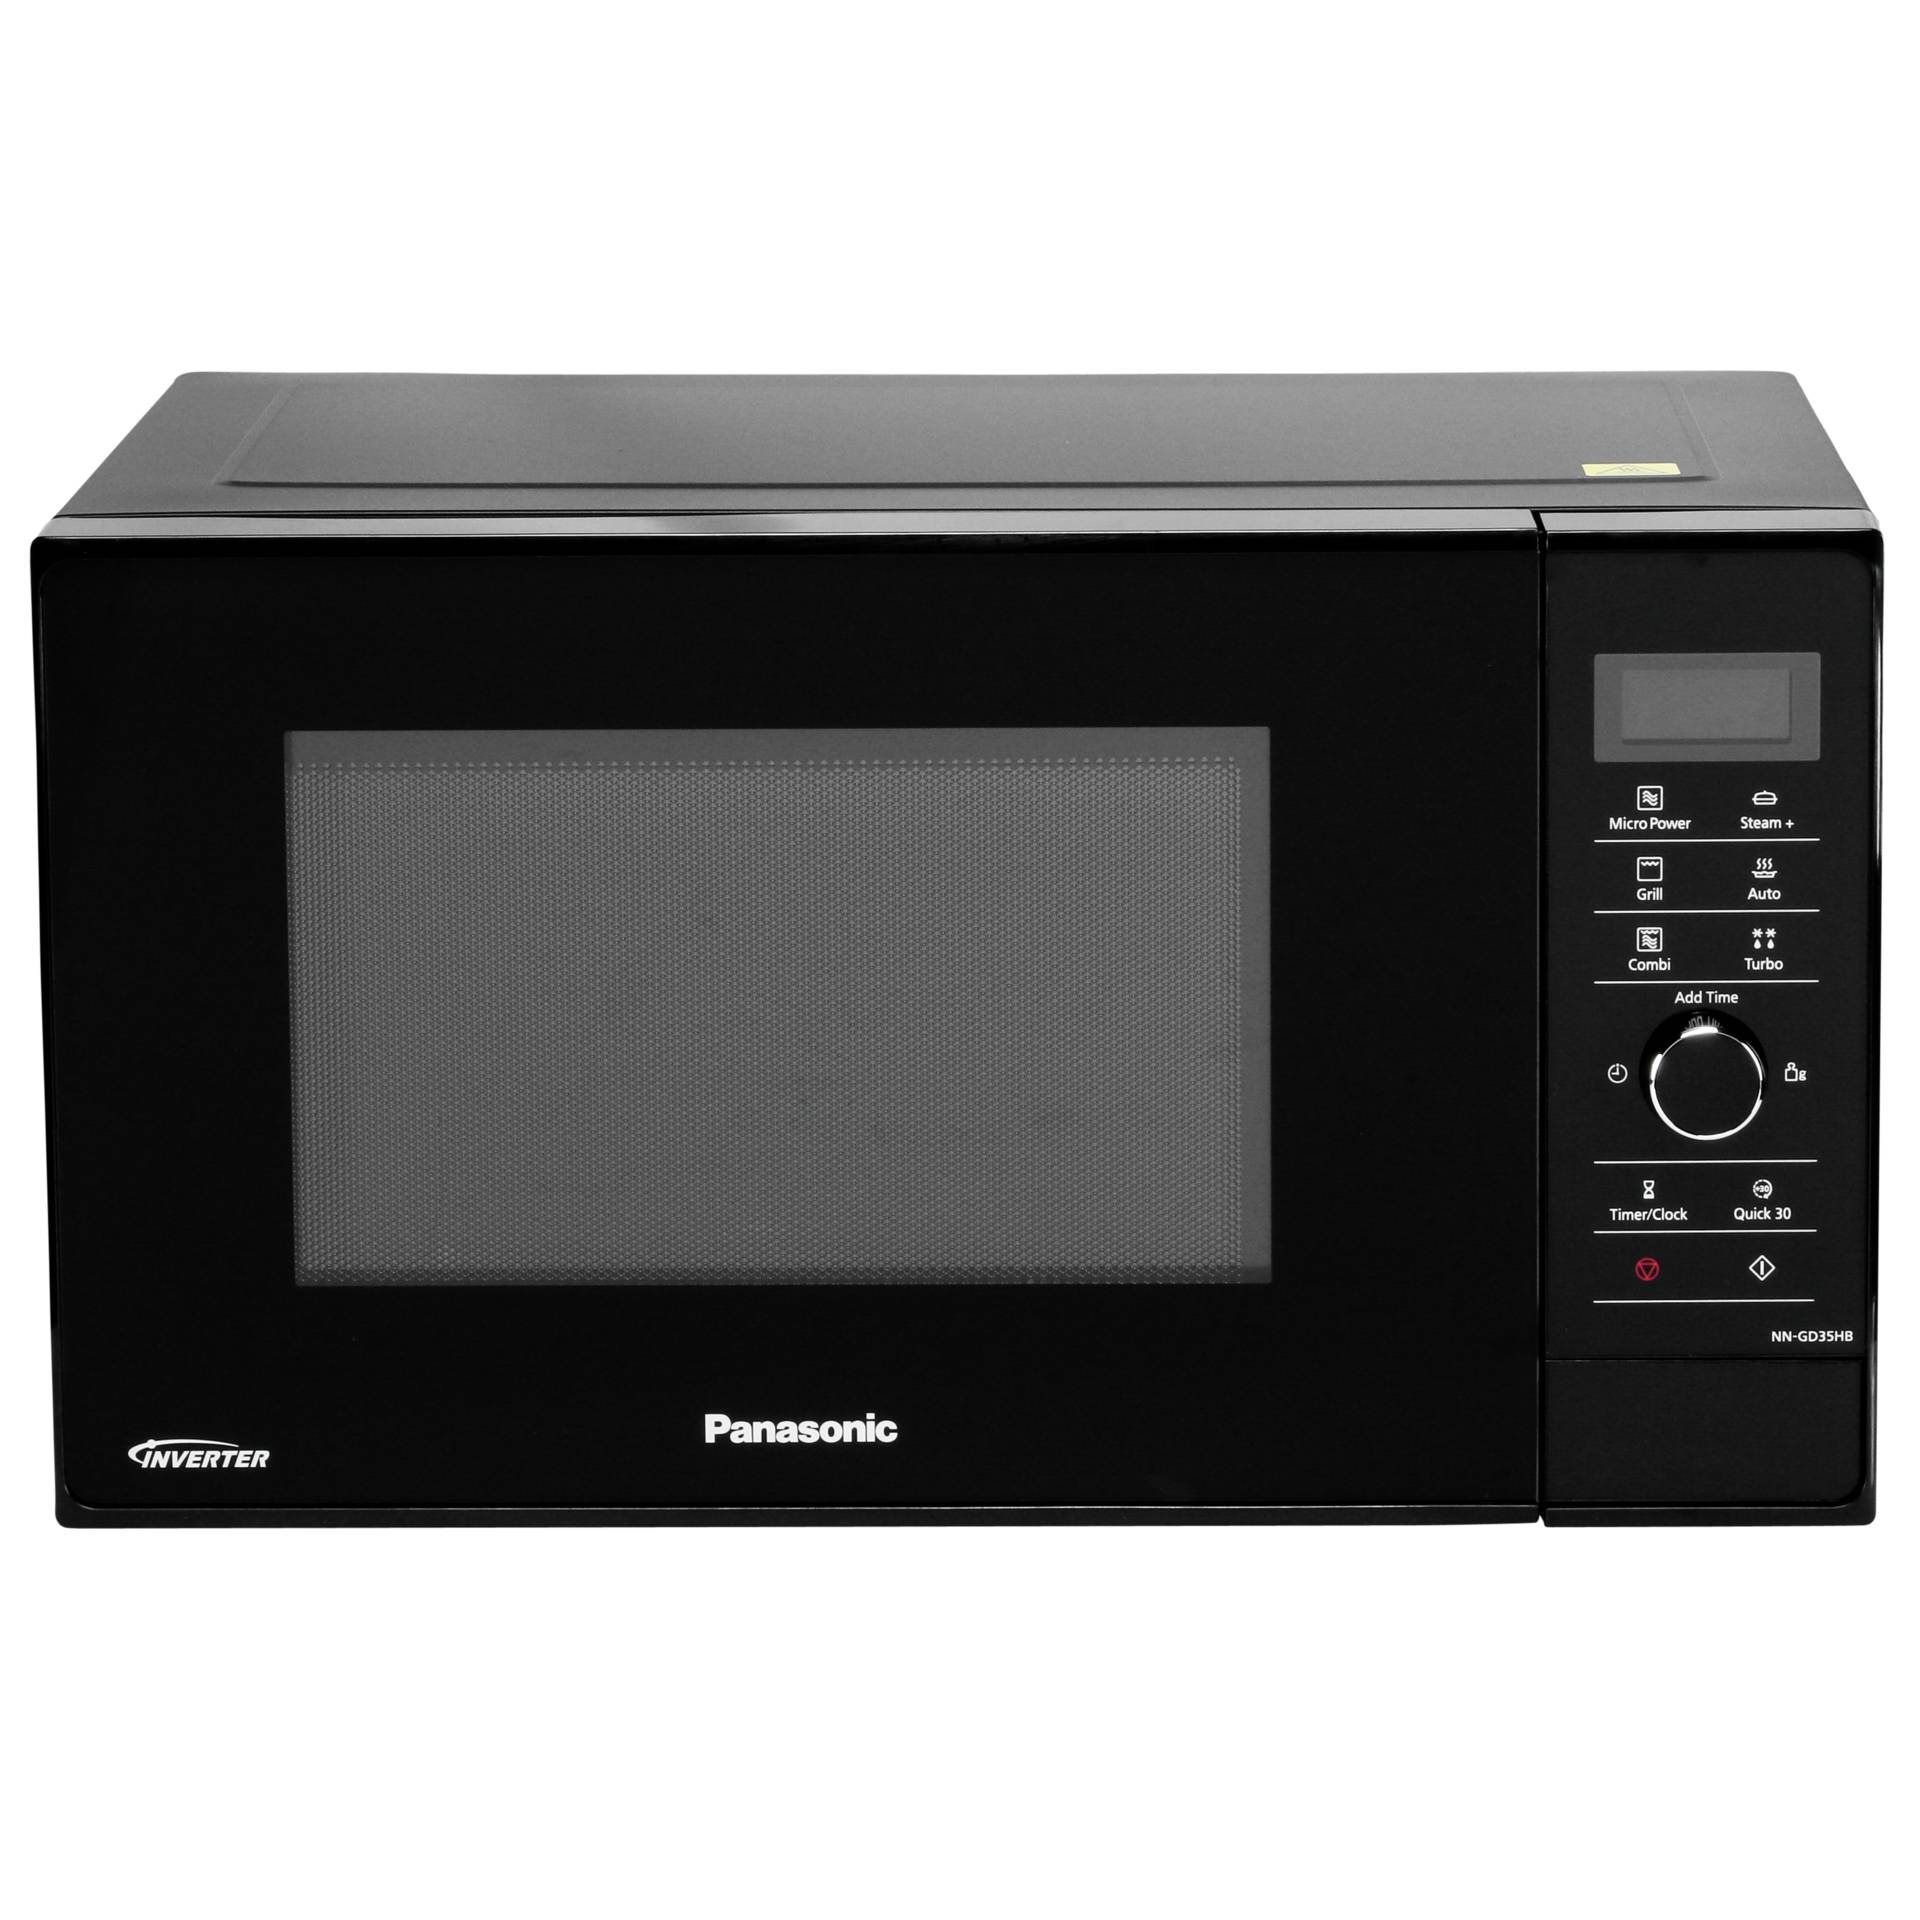 Panasonic NN GD 35 HBGTG schwarz